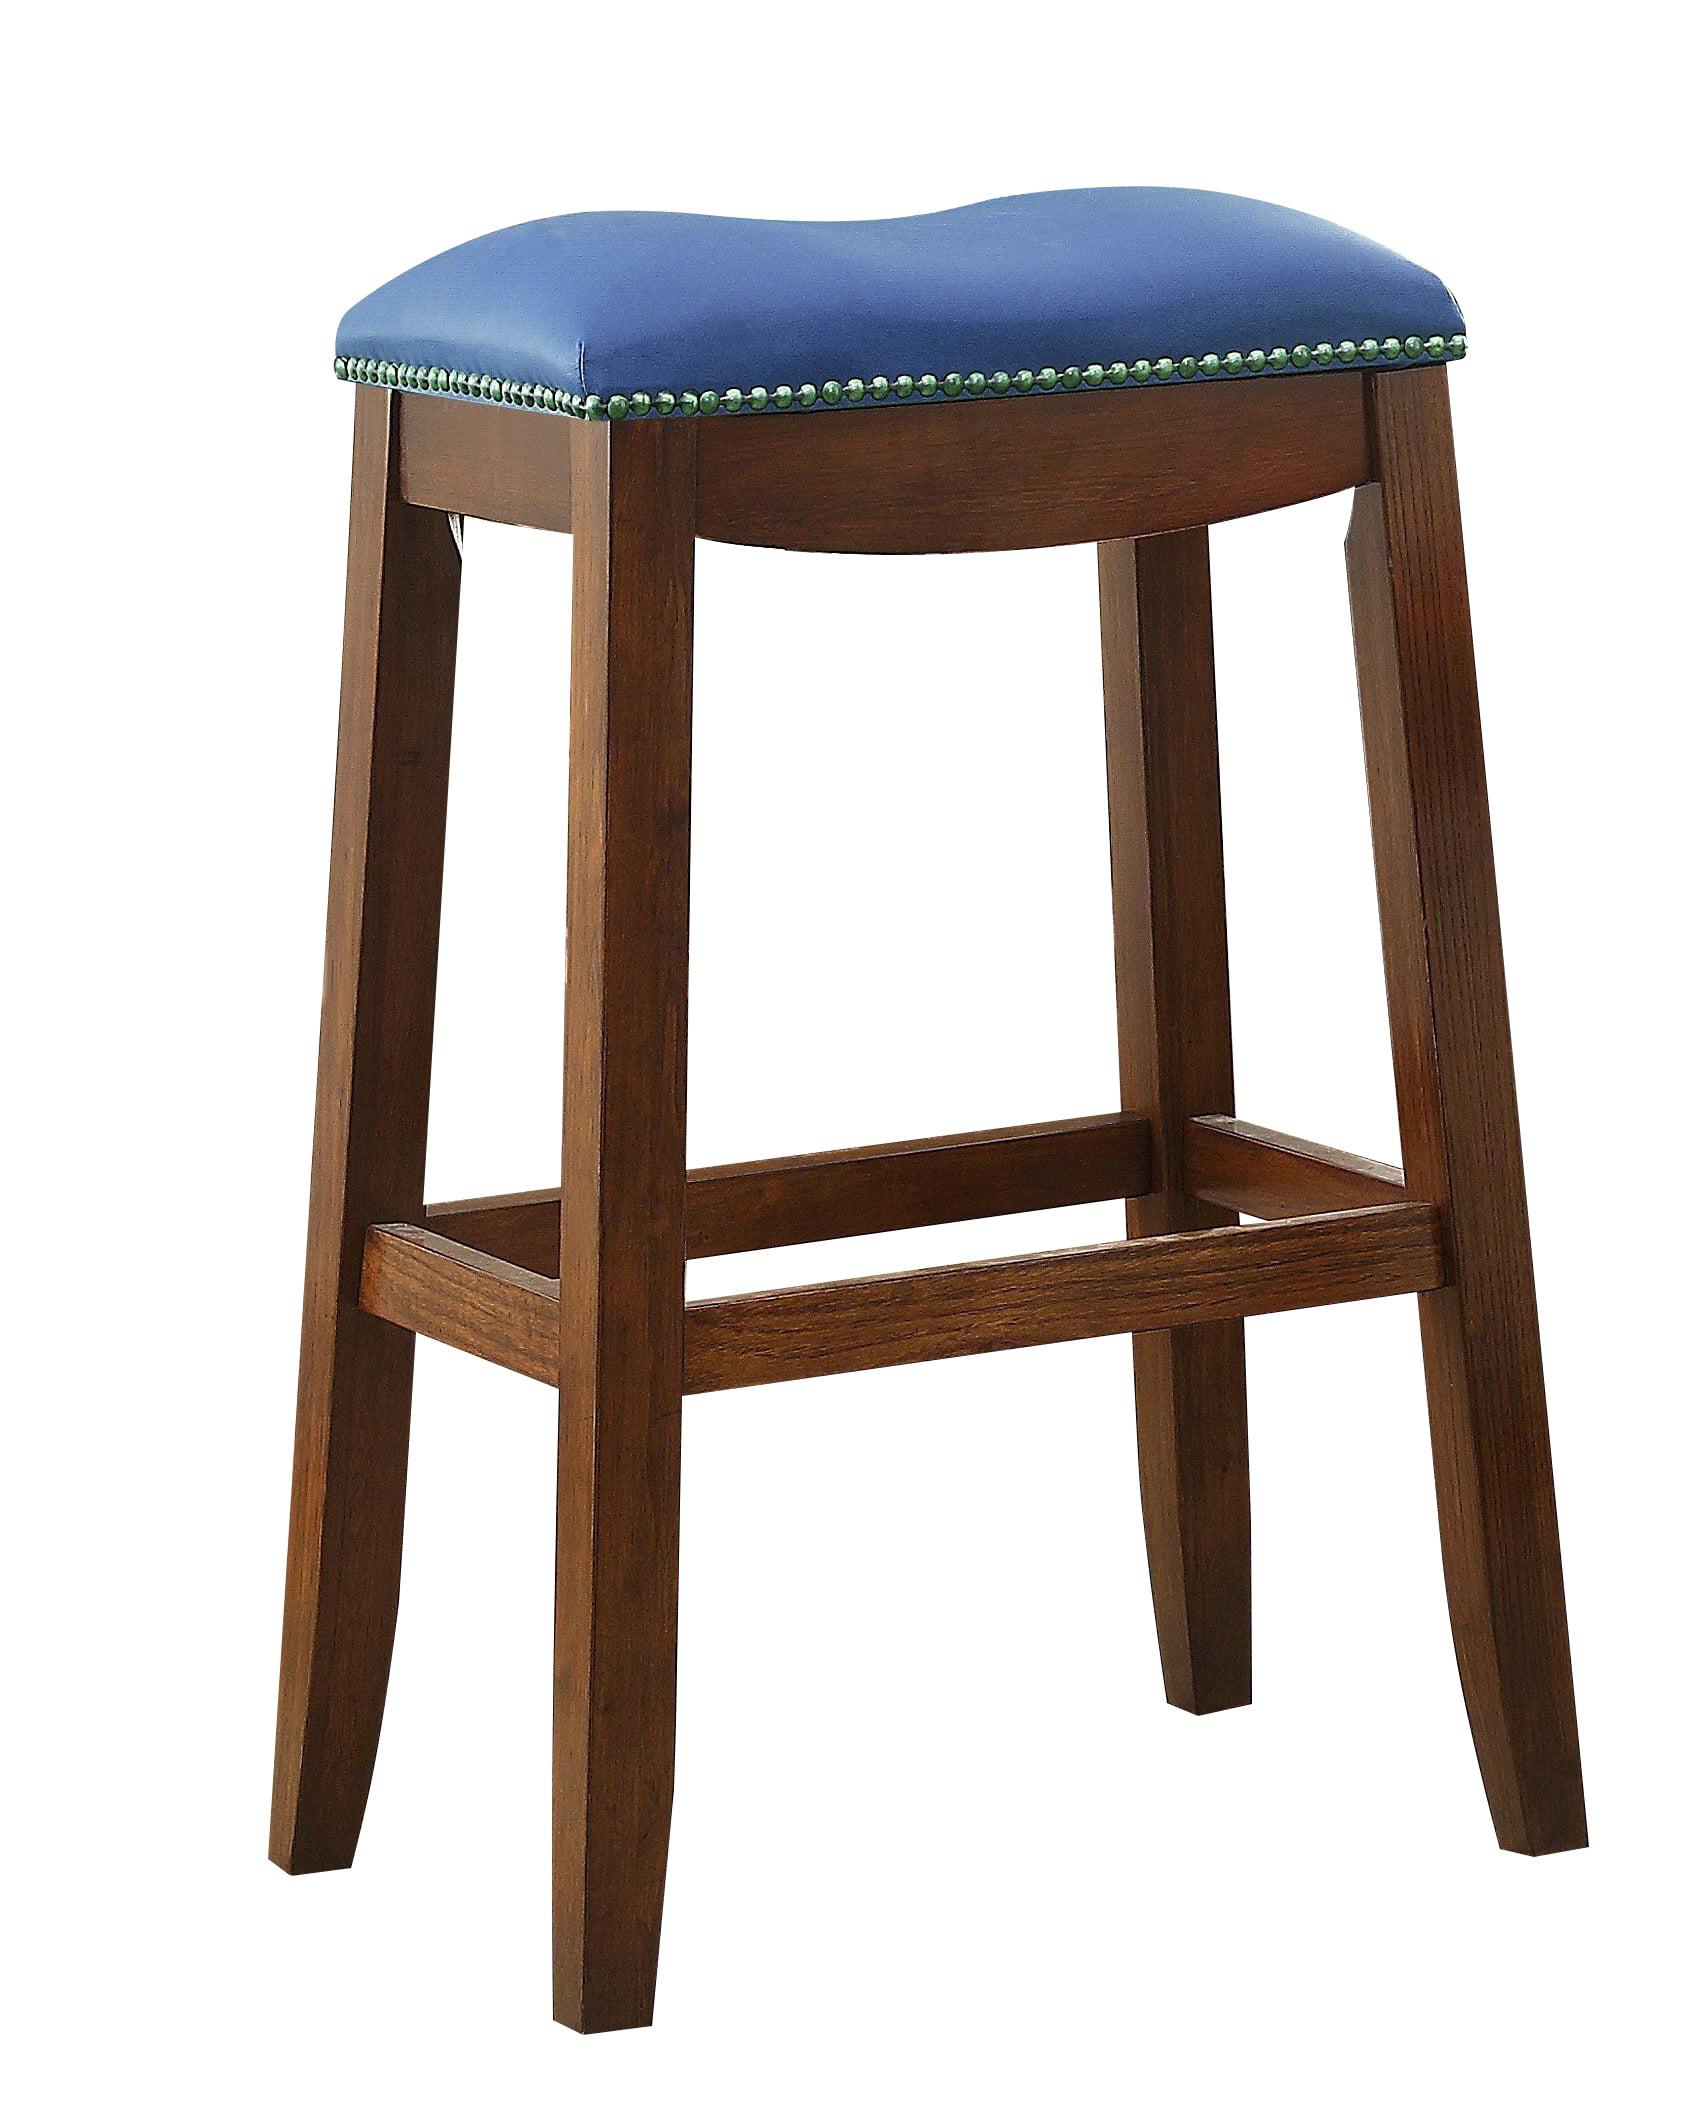 ACME Delta Bar Stool, Blue PU & Oak (Set of 2) by Acme Furniture